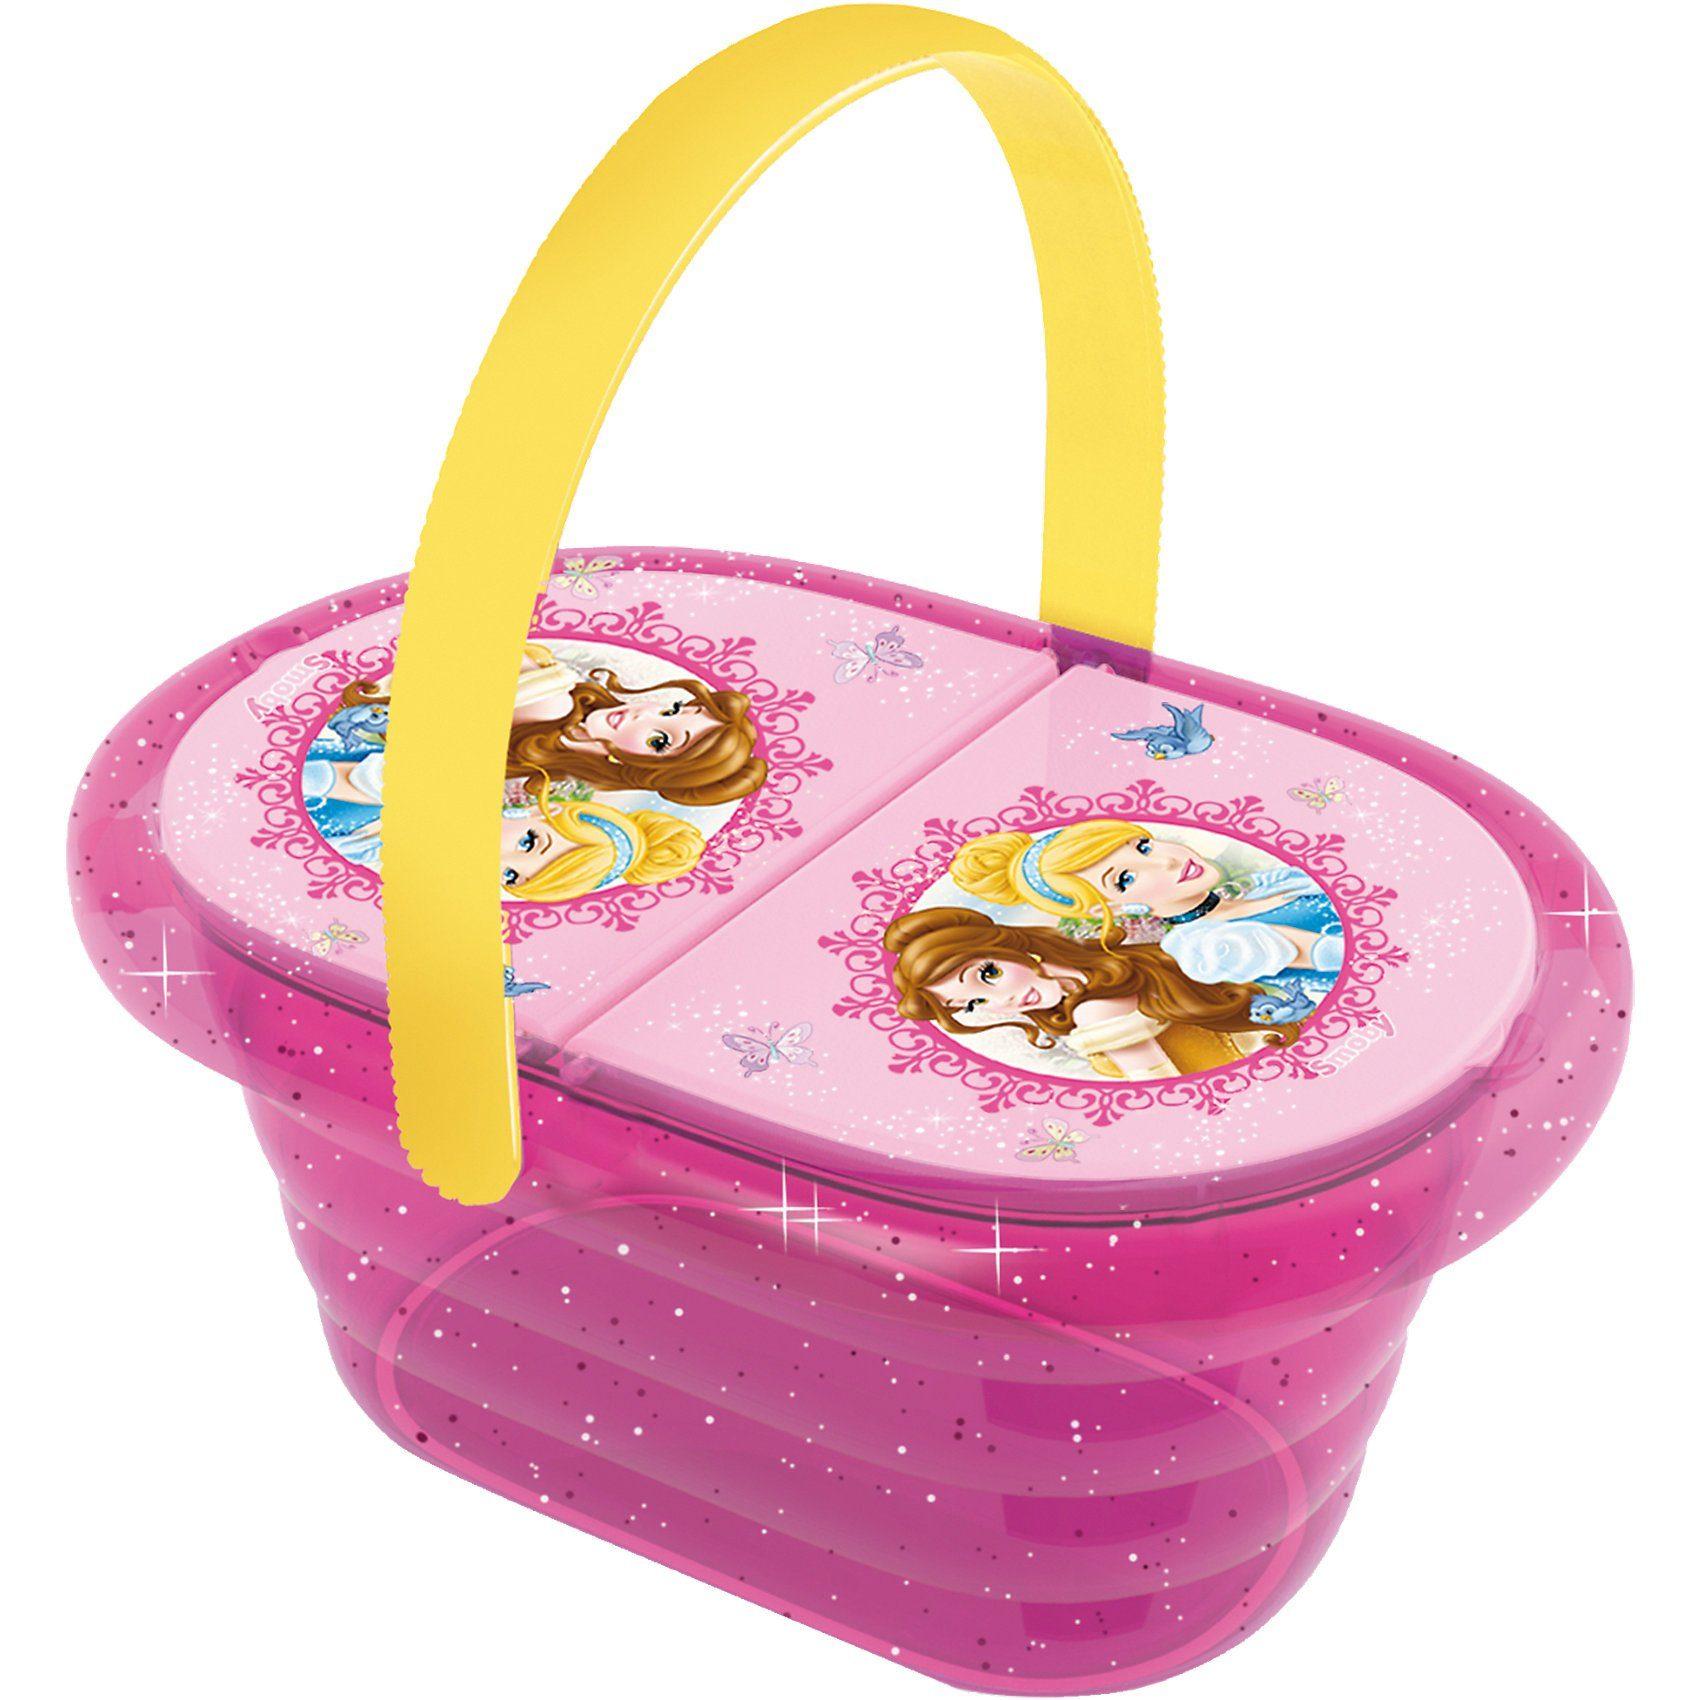 Smoby Disney Princess Picknick-Korb mit Spielgeschirr